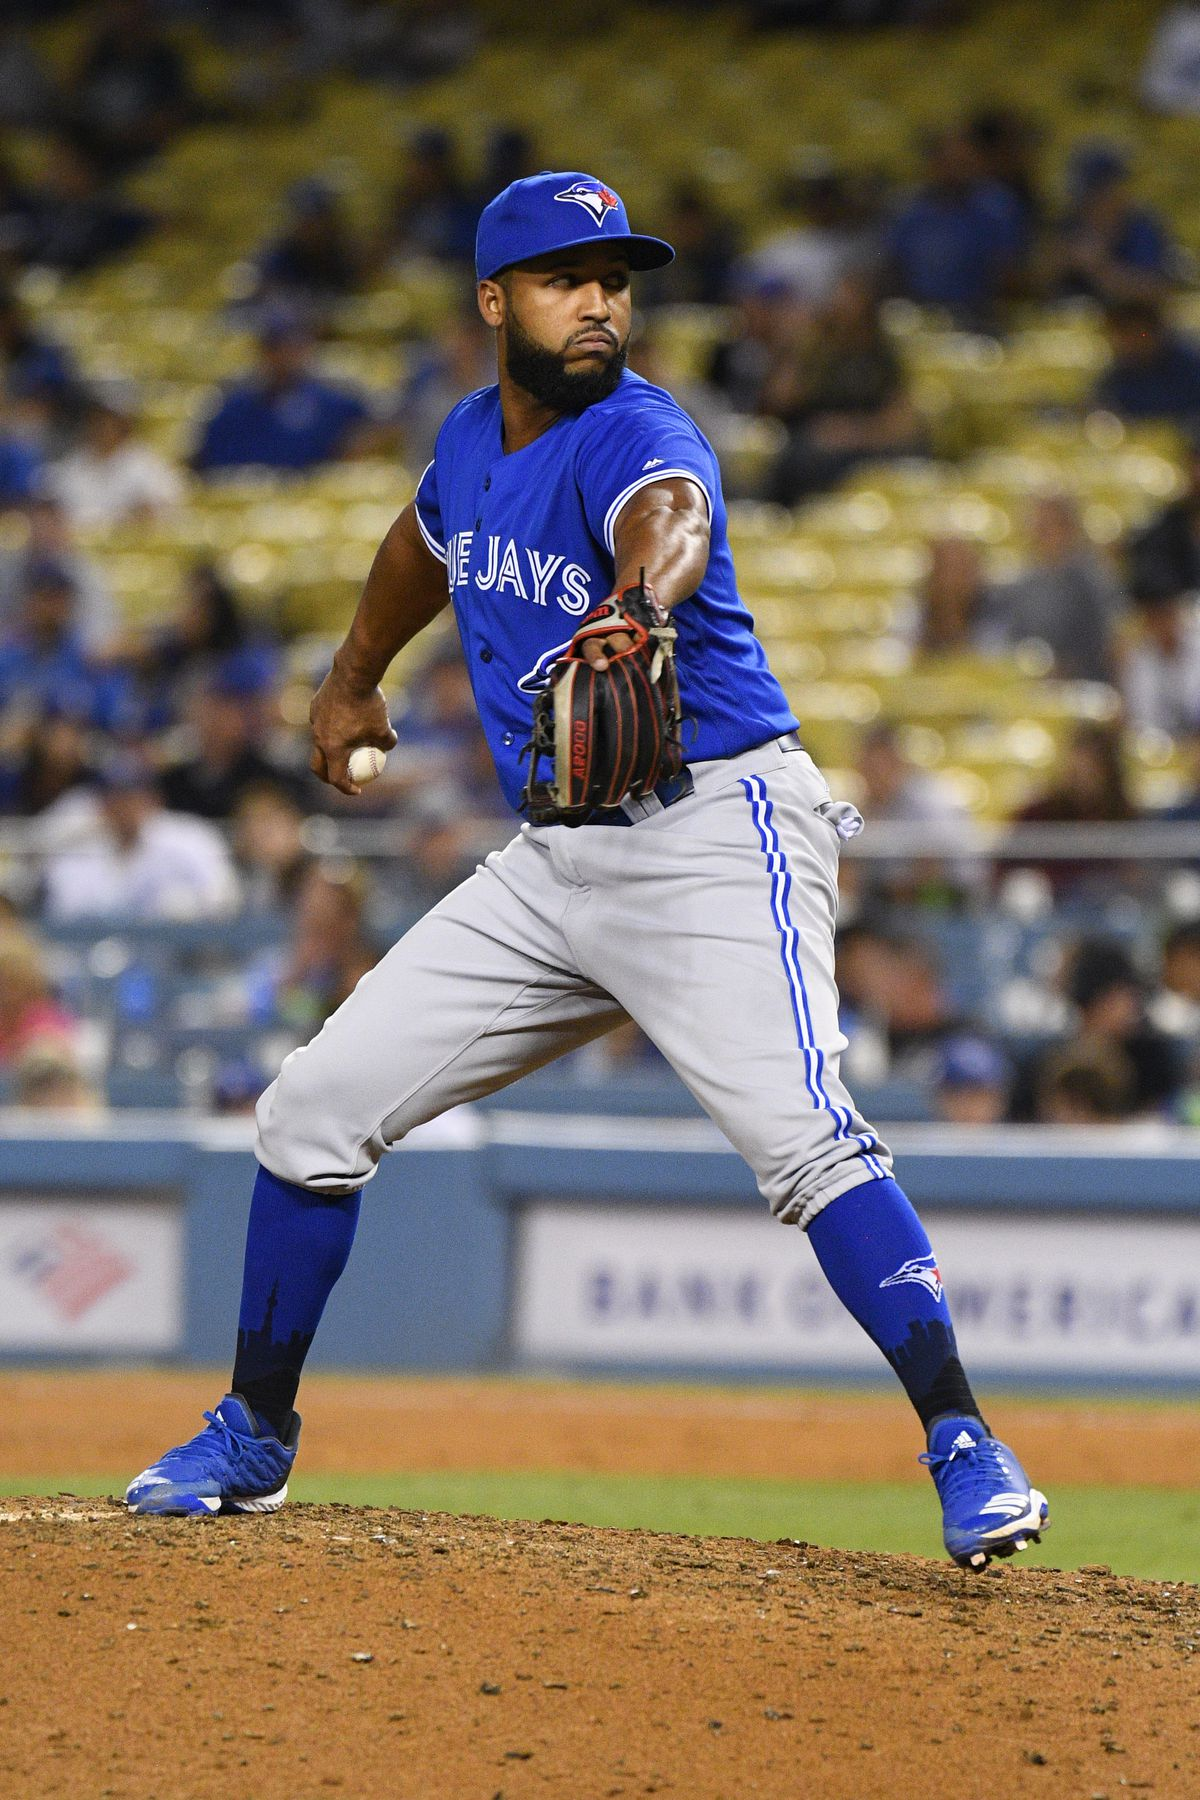 Toronto Blue Jays infielder Richard Urena (7) throws a pitch.